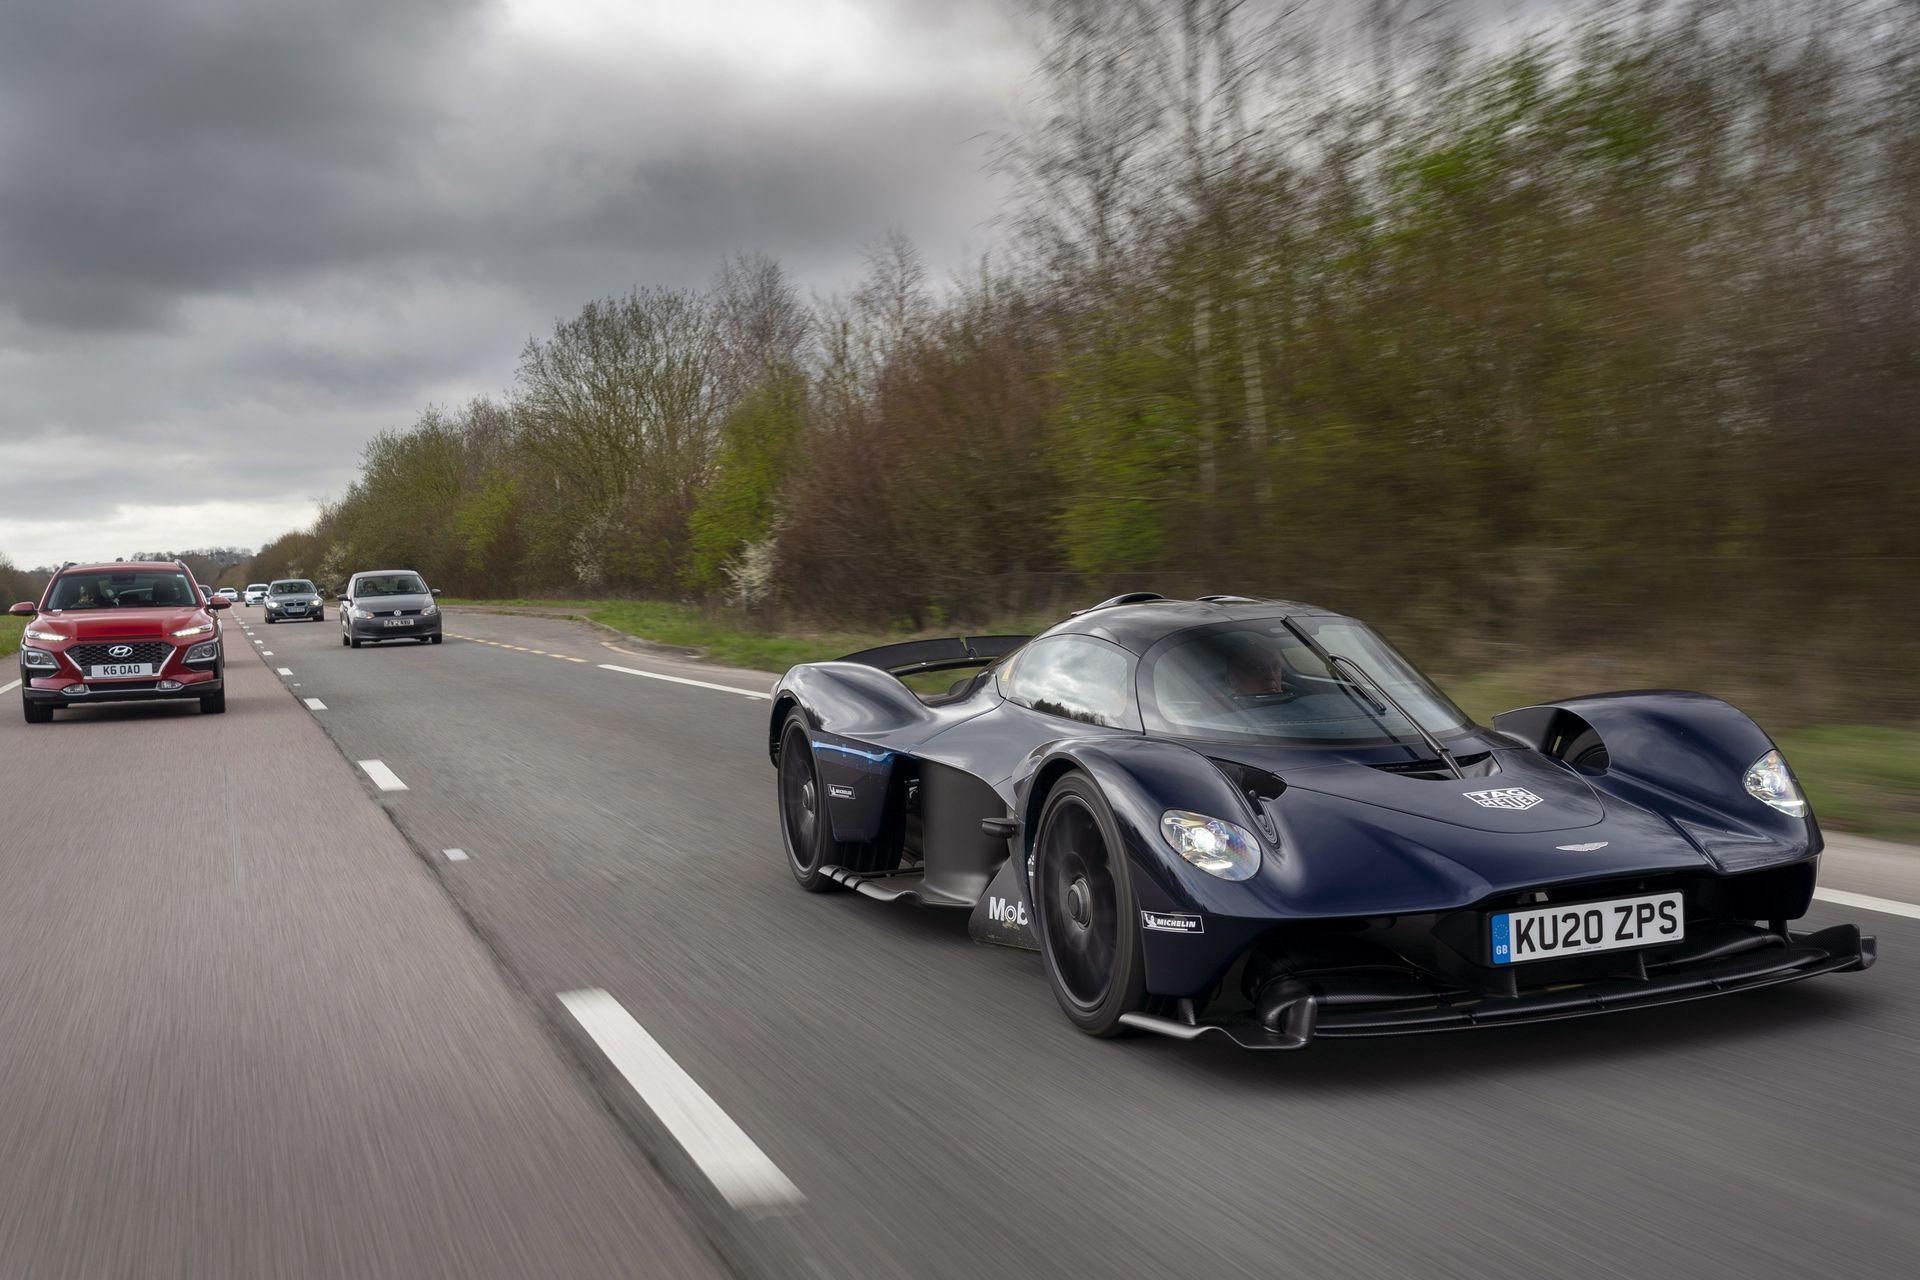 Aston_Martin_Valkyrie_public_roads_0000